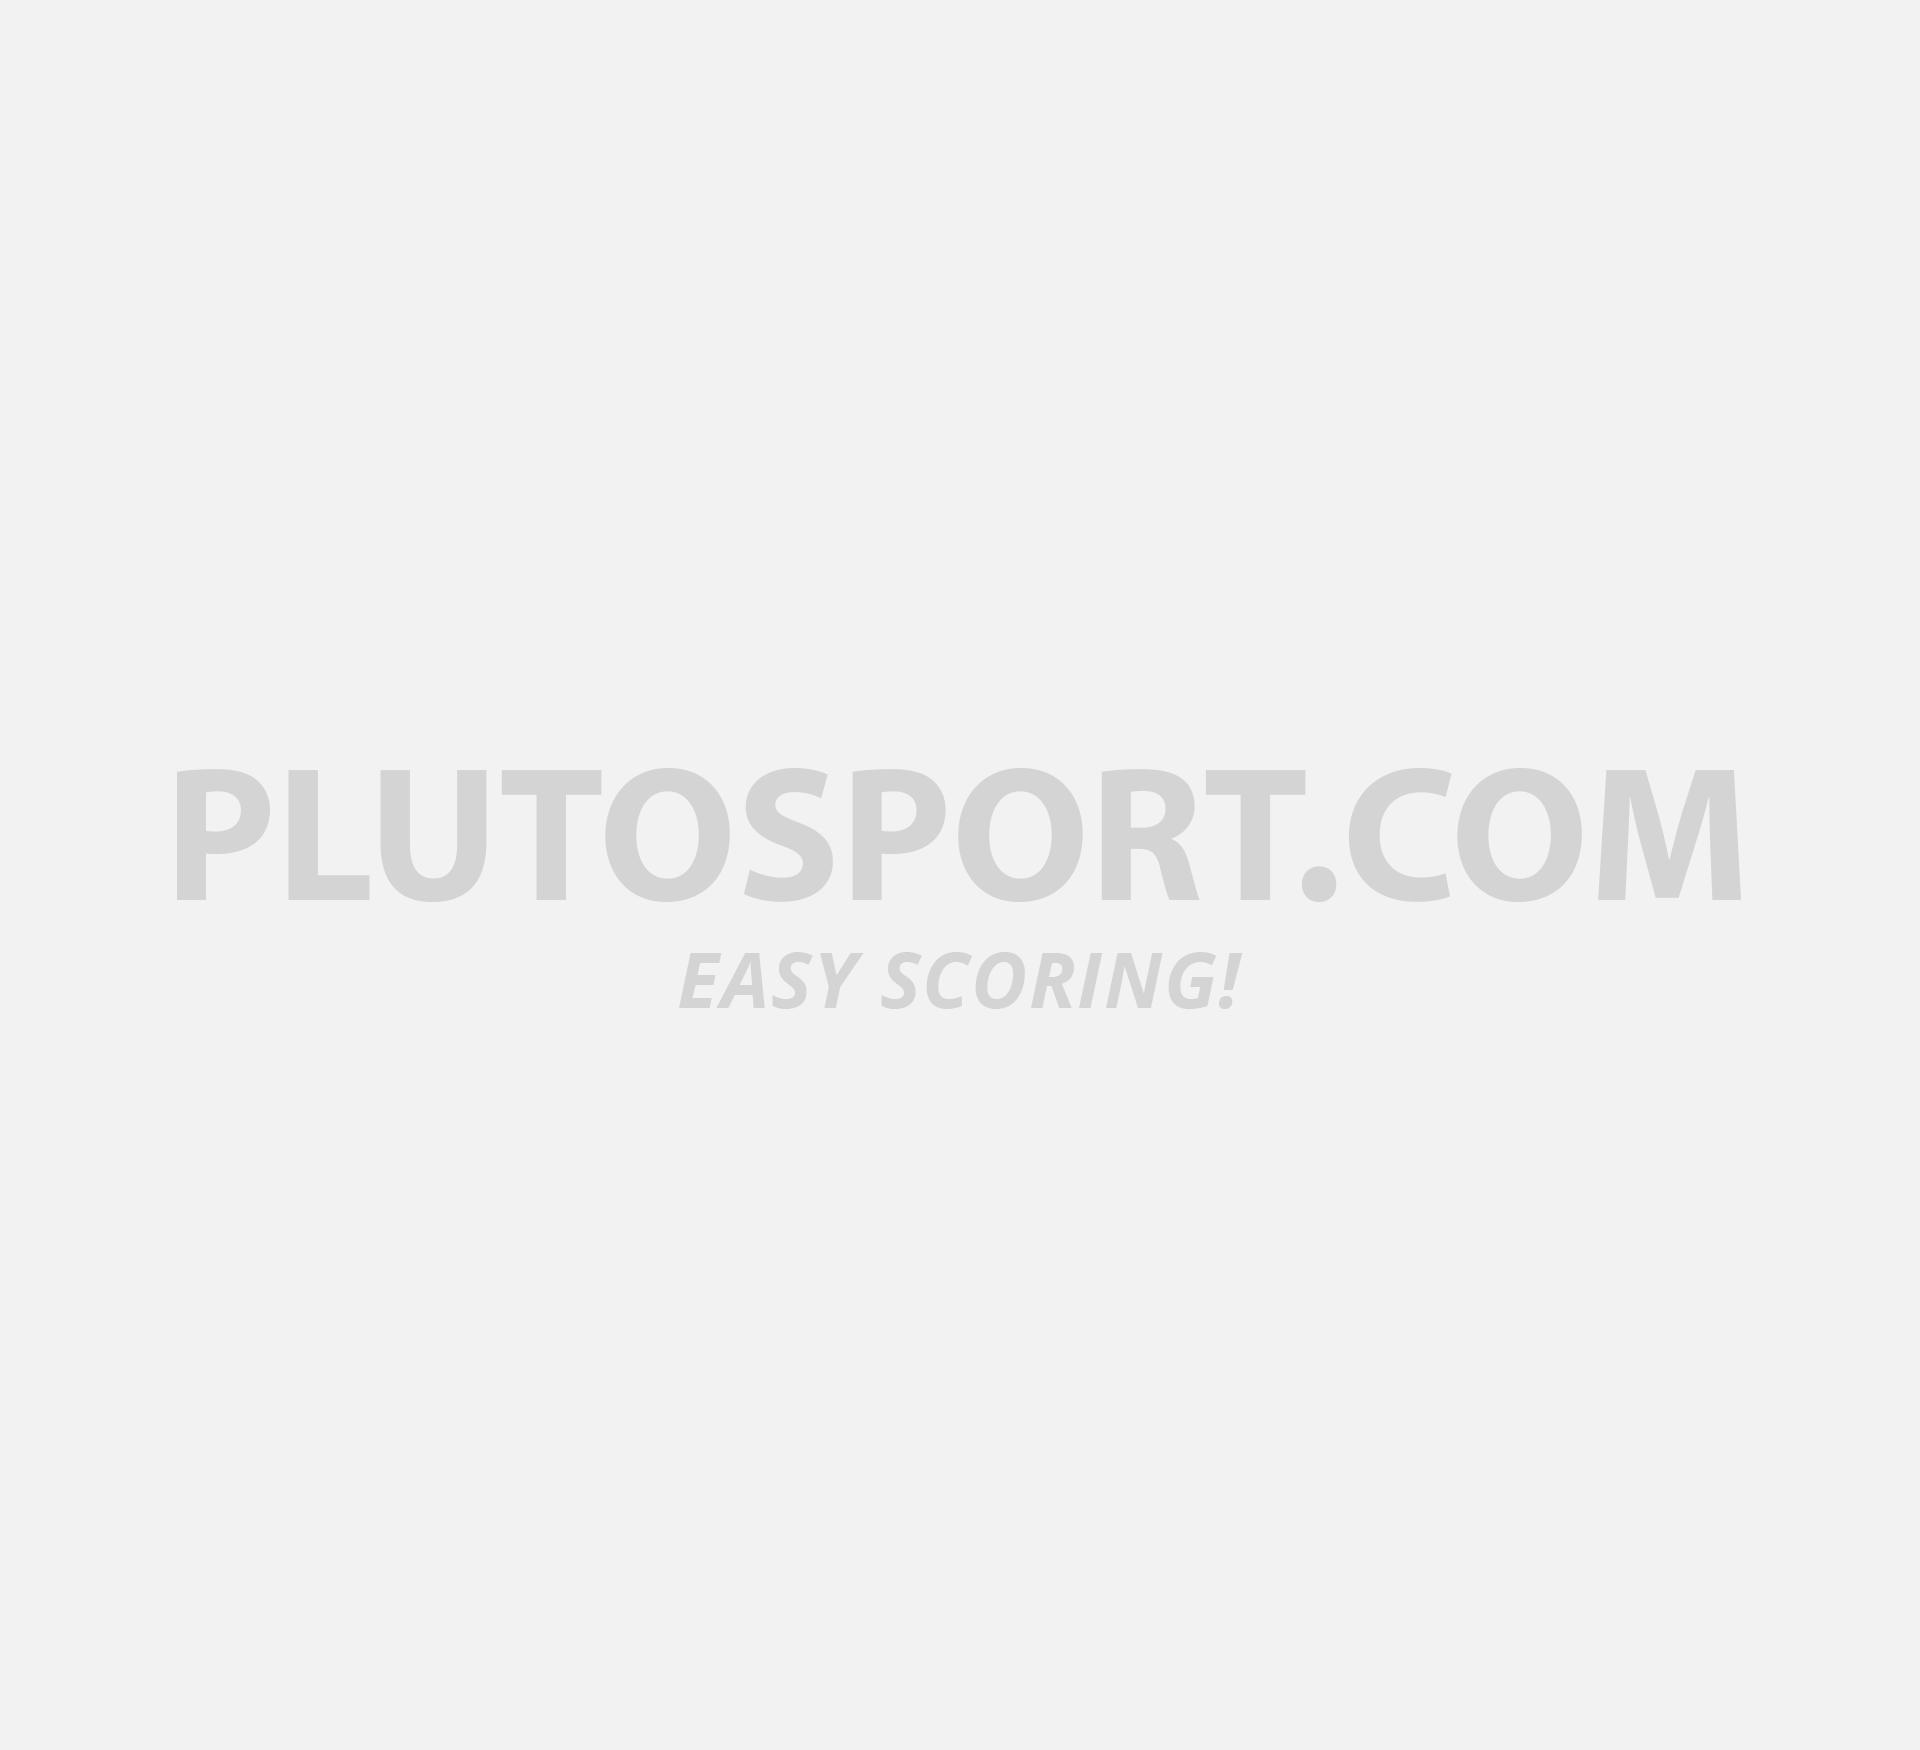 84aee33a44816 Nike Dart 9 Runningshoe Women s - Neutral - Shoes - Running - Sports ...